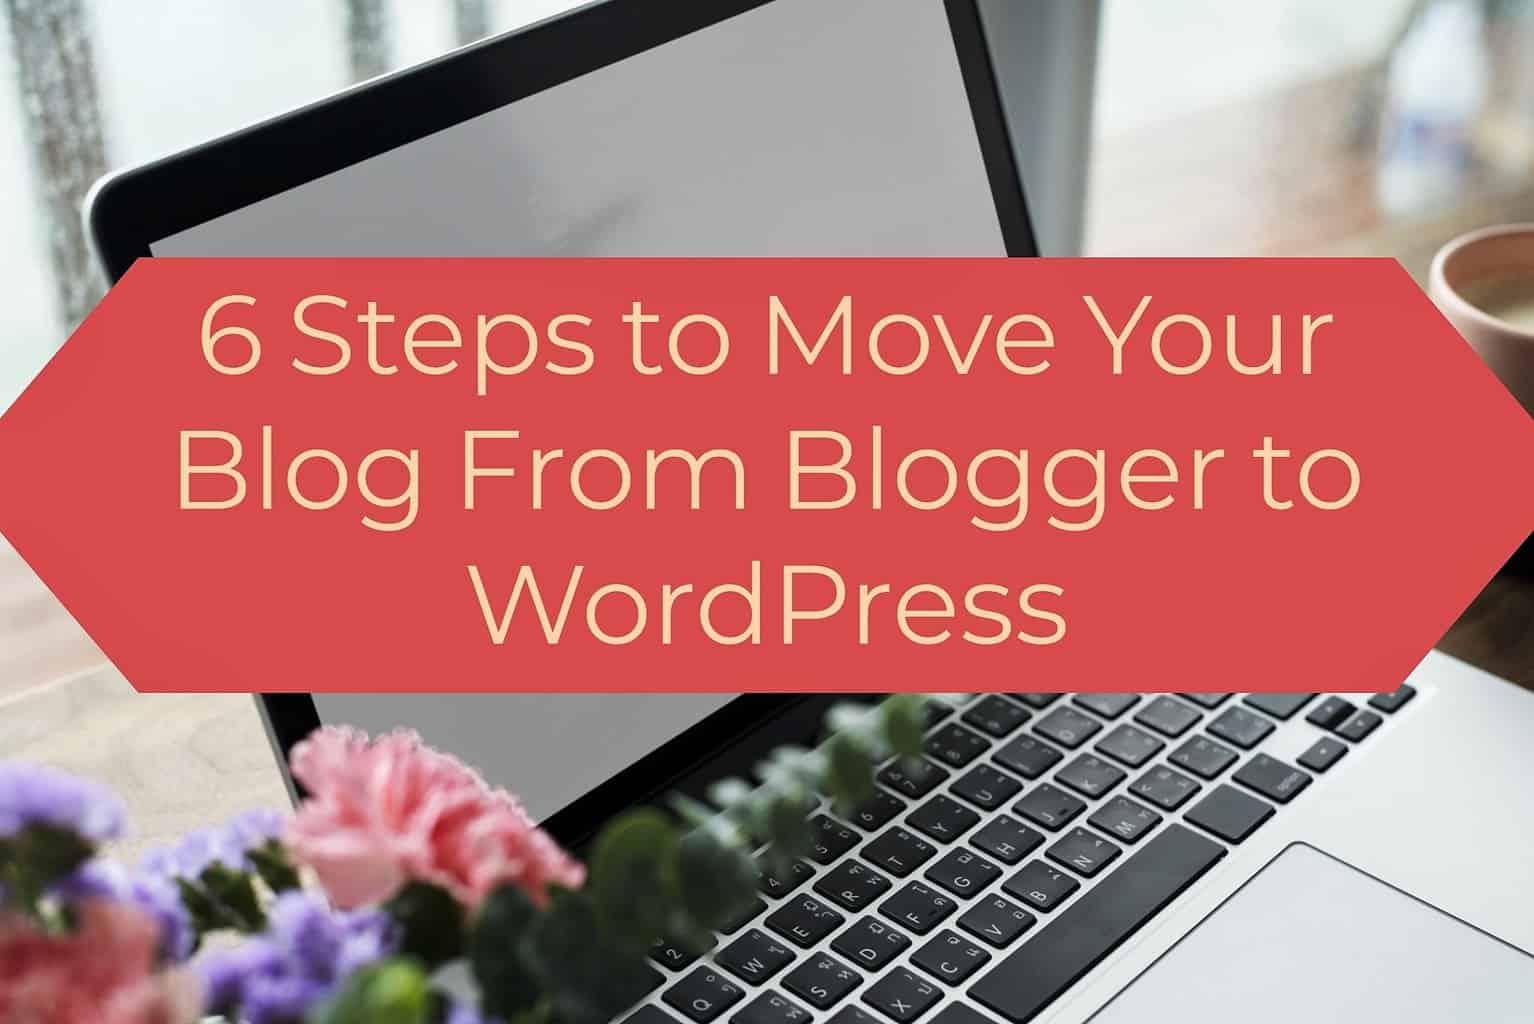 Blogger to WordPress